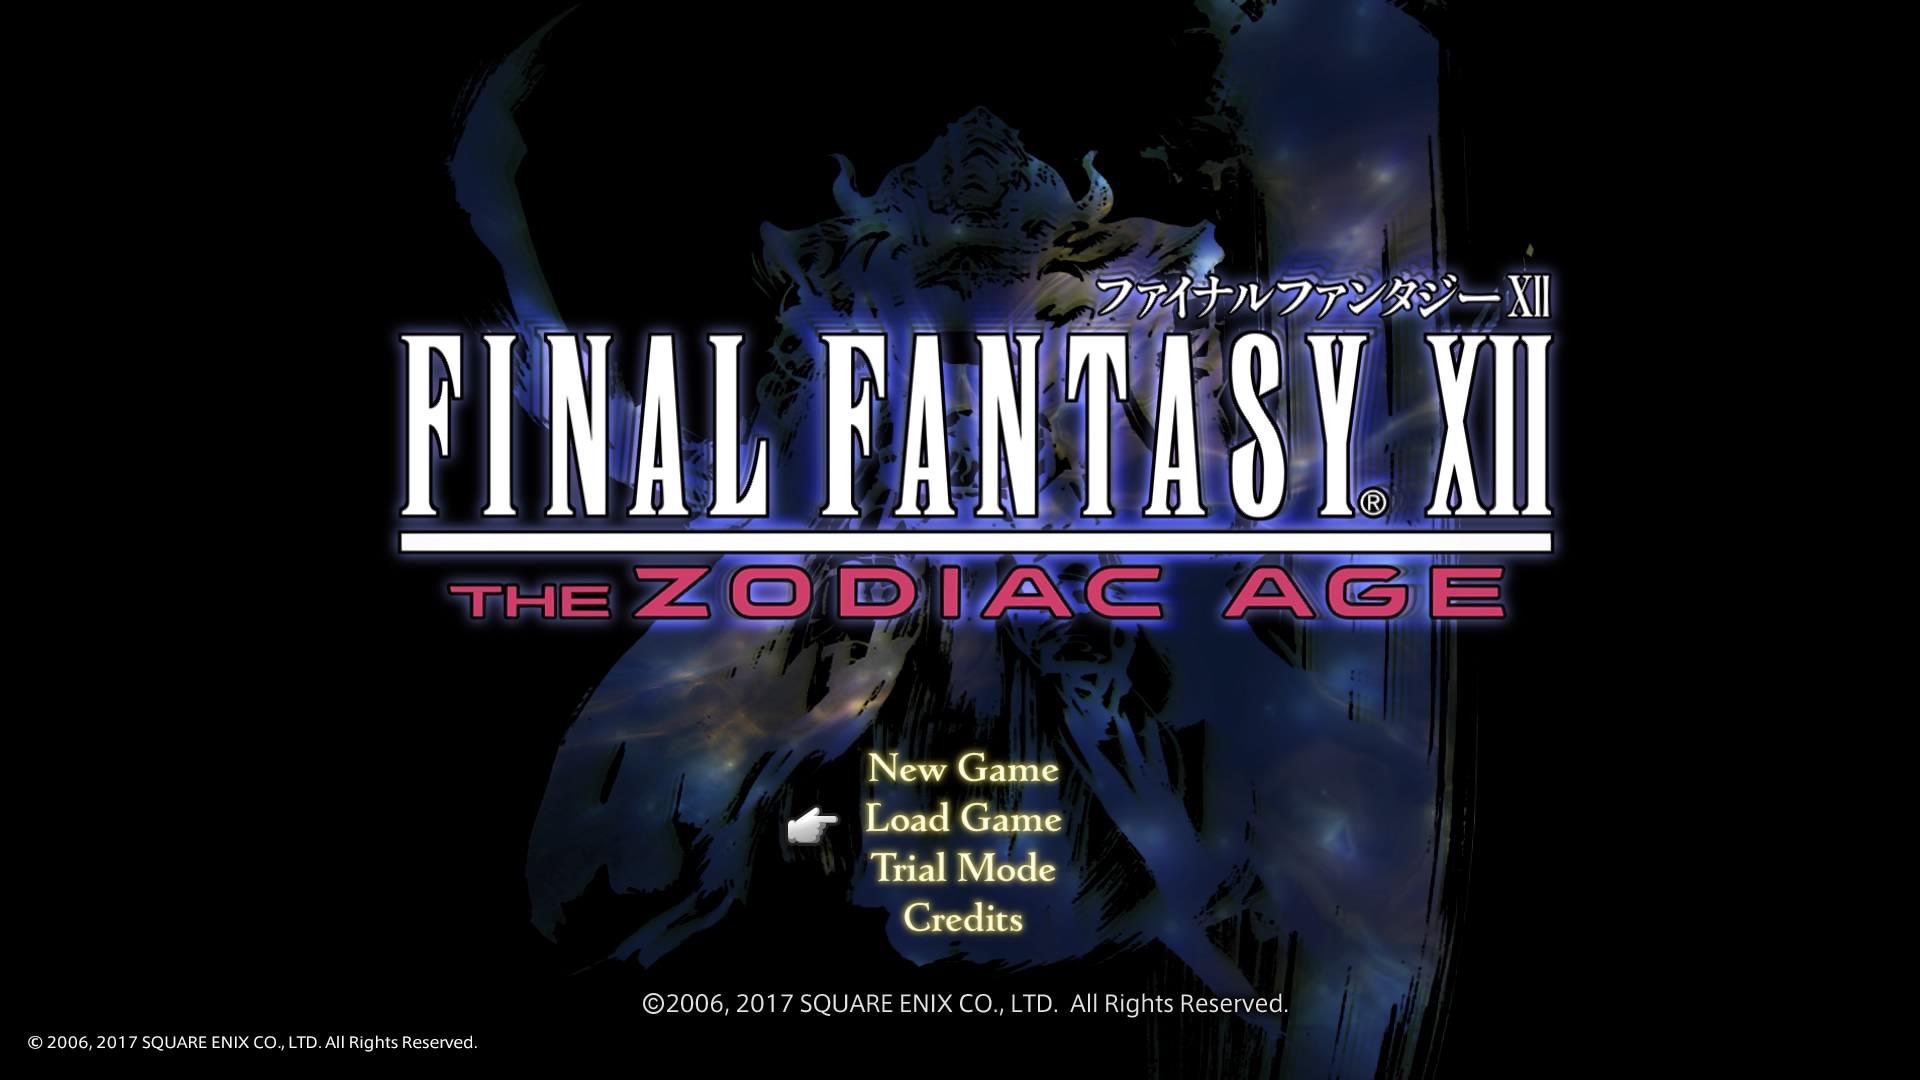 FFXII THE ZODIAC AGE発売。10年経っても色褪せない名作を再び